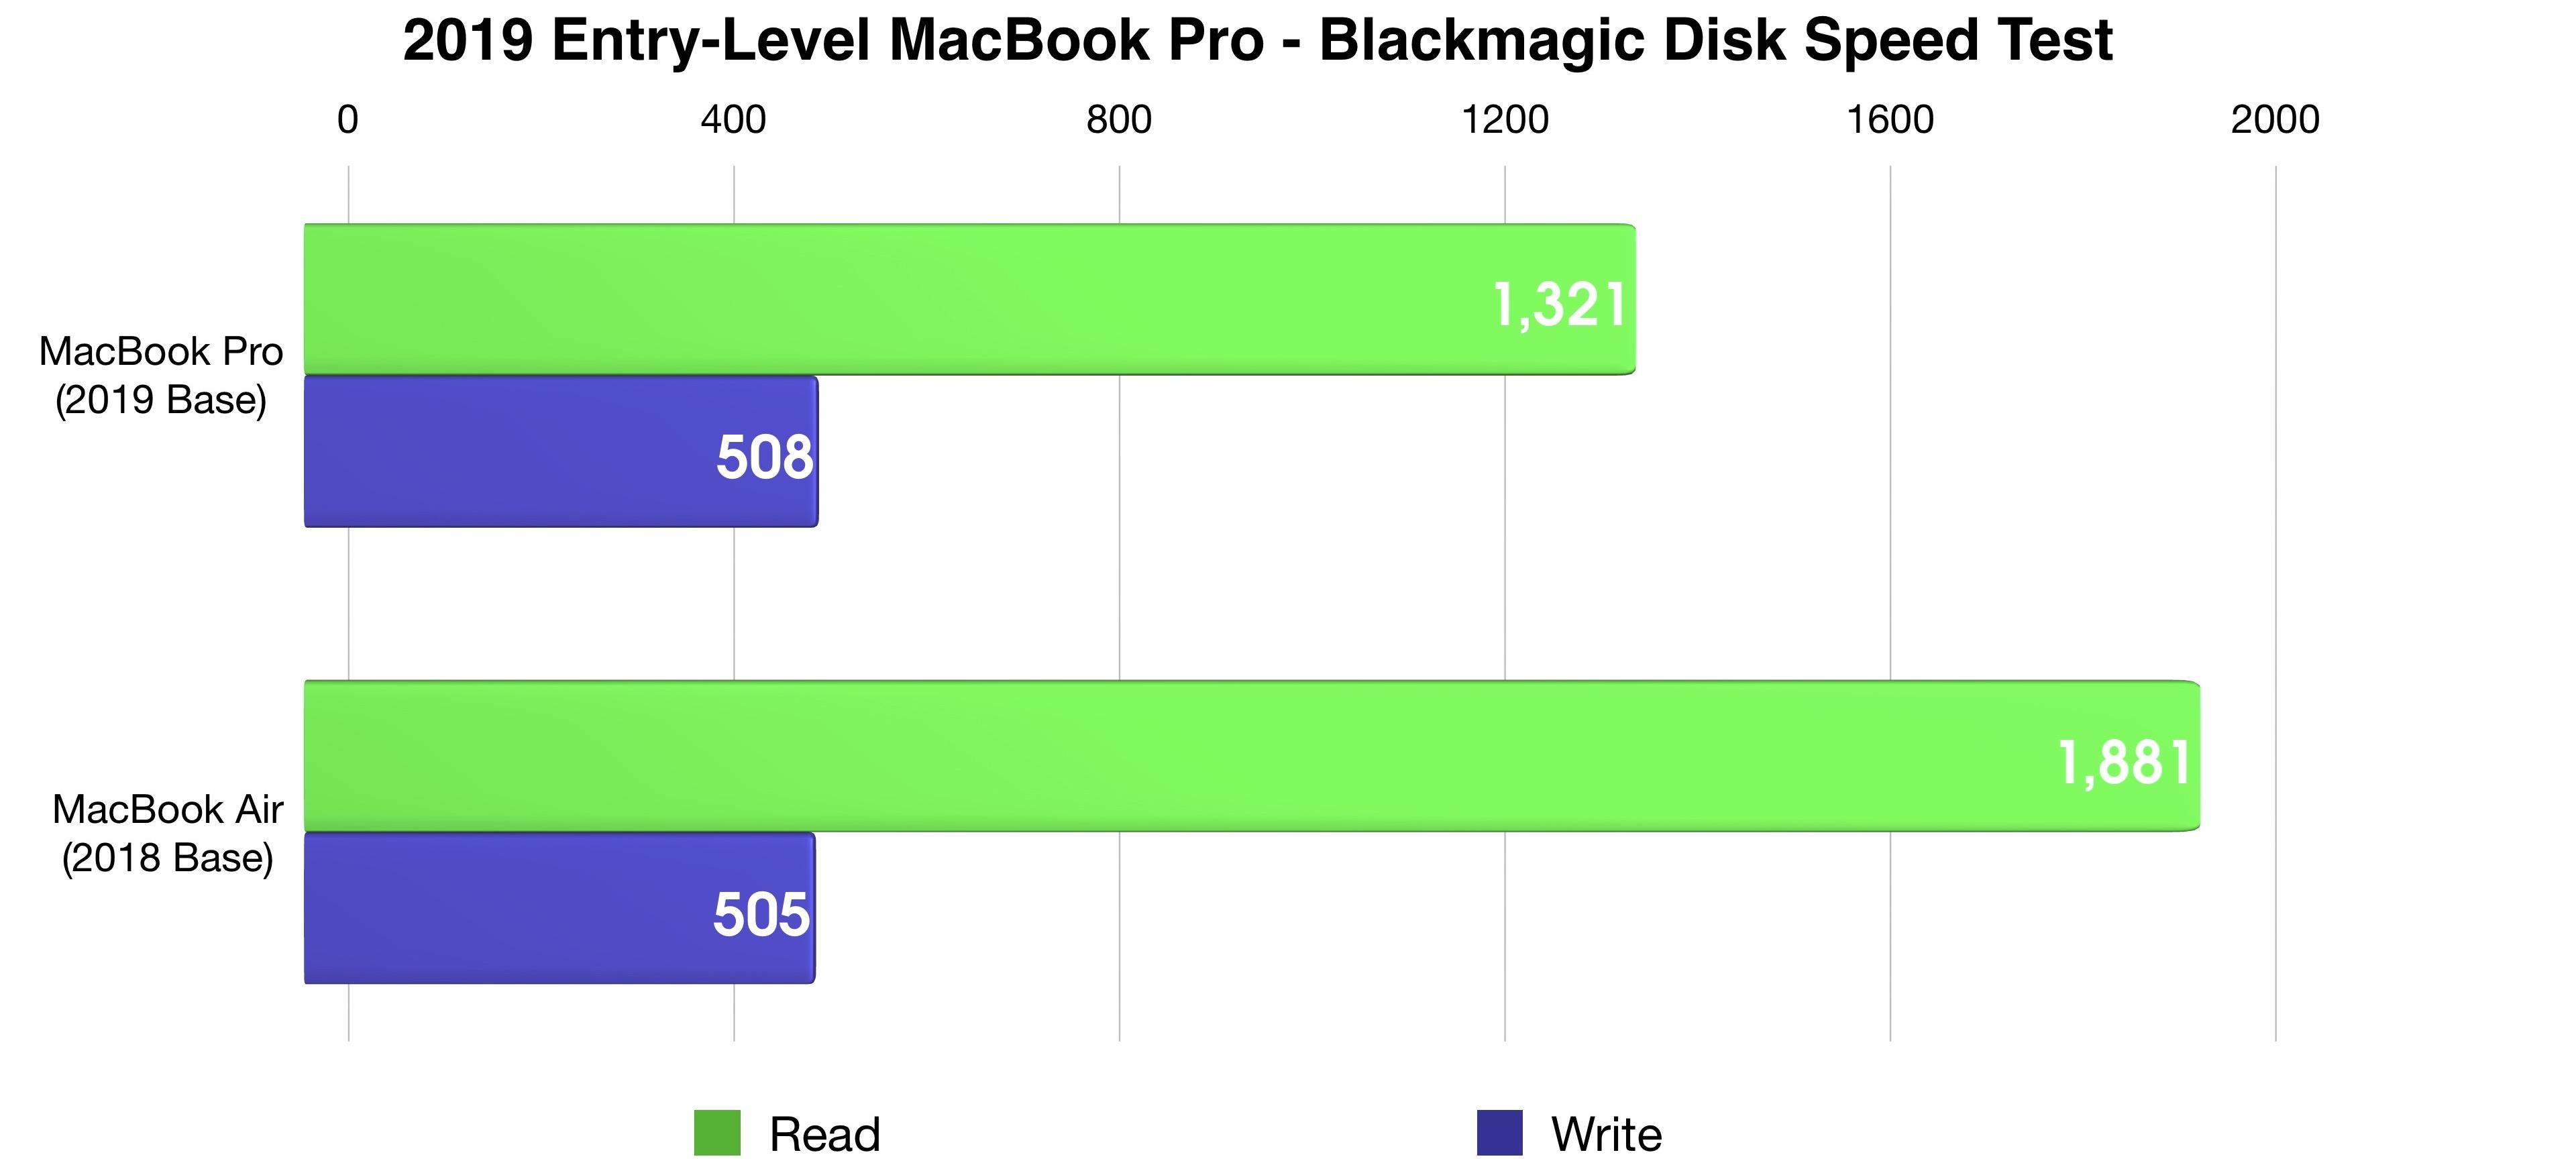 2019 MacBook Pro Blackmagic Benchmark